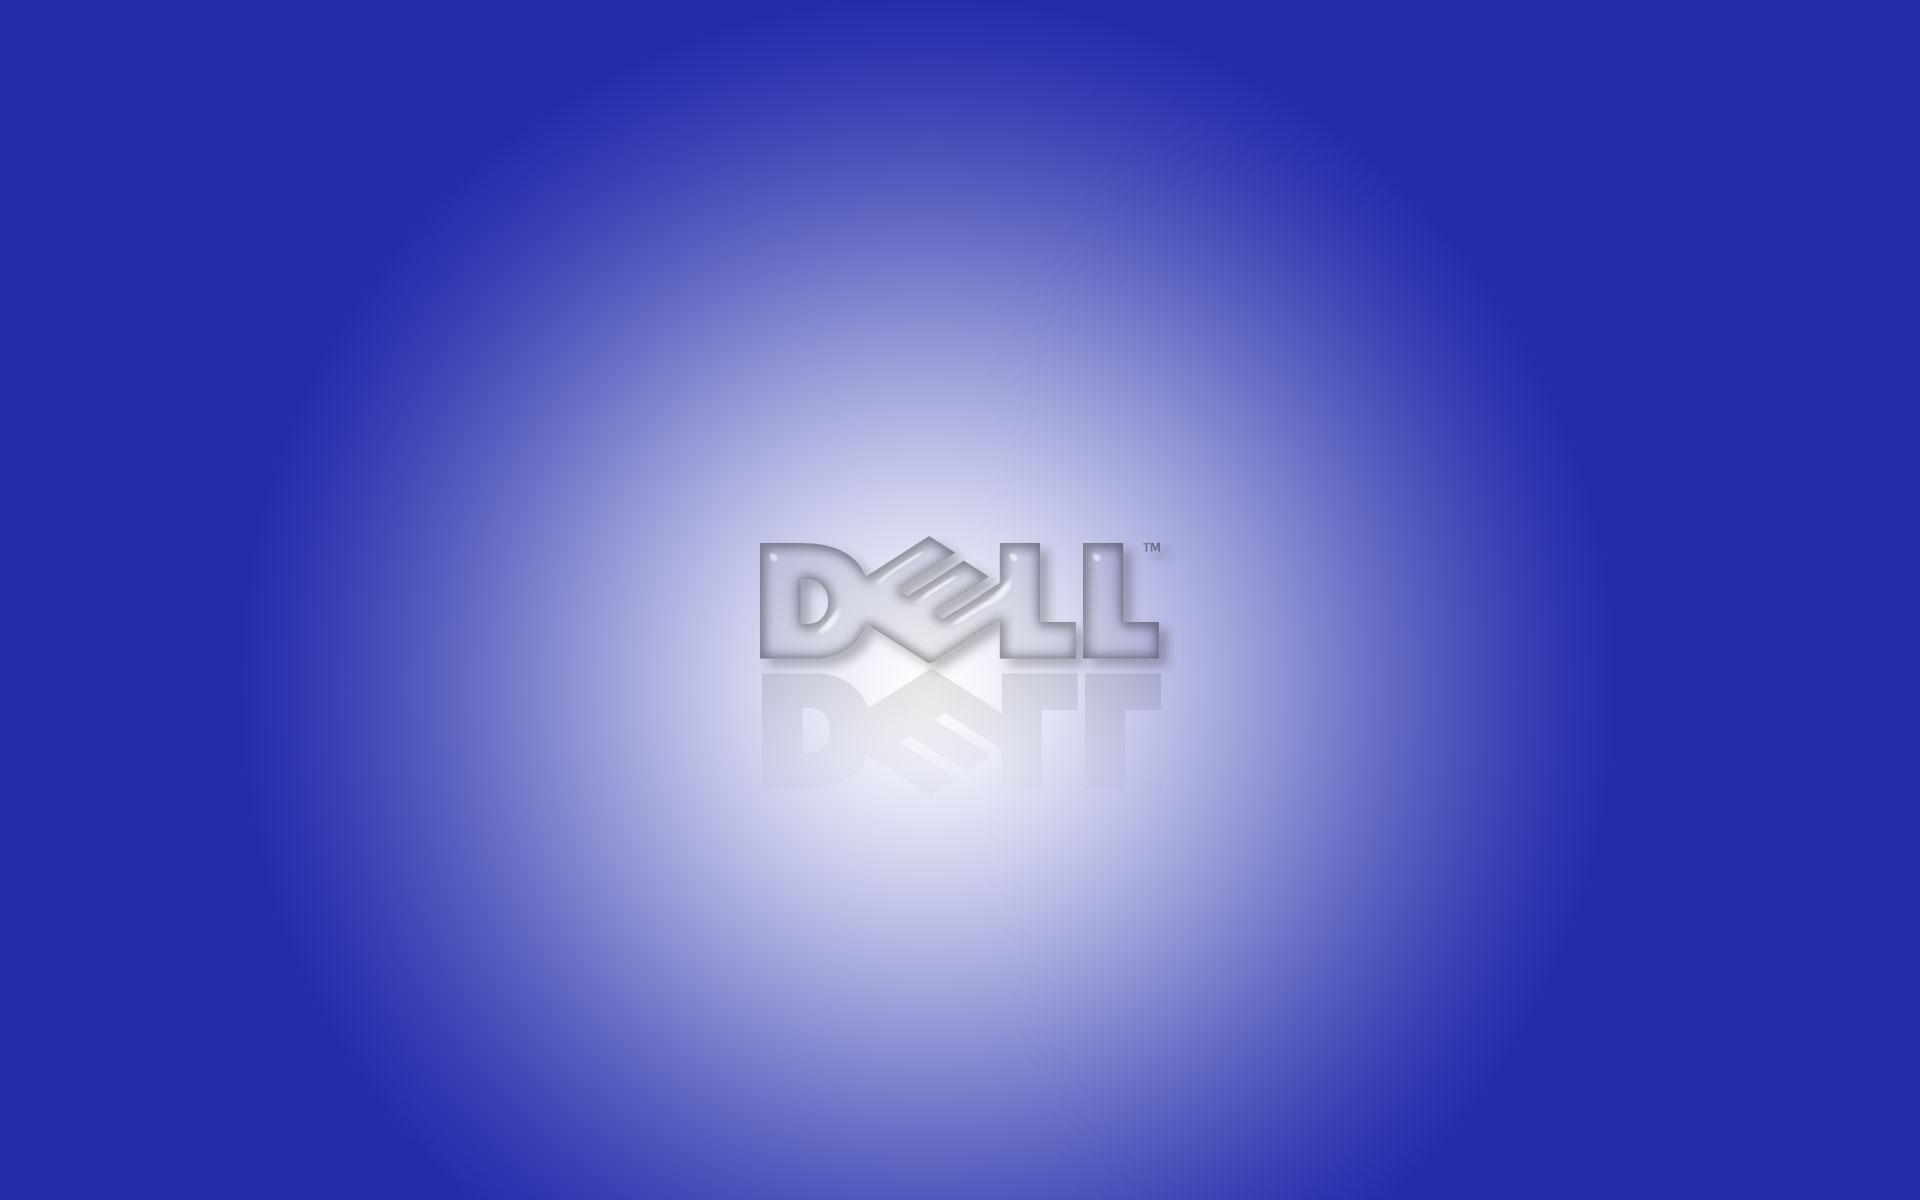 dell blue widescreen desktop background 880